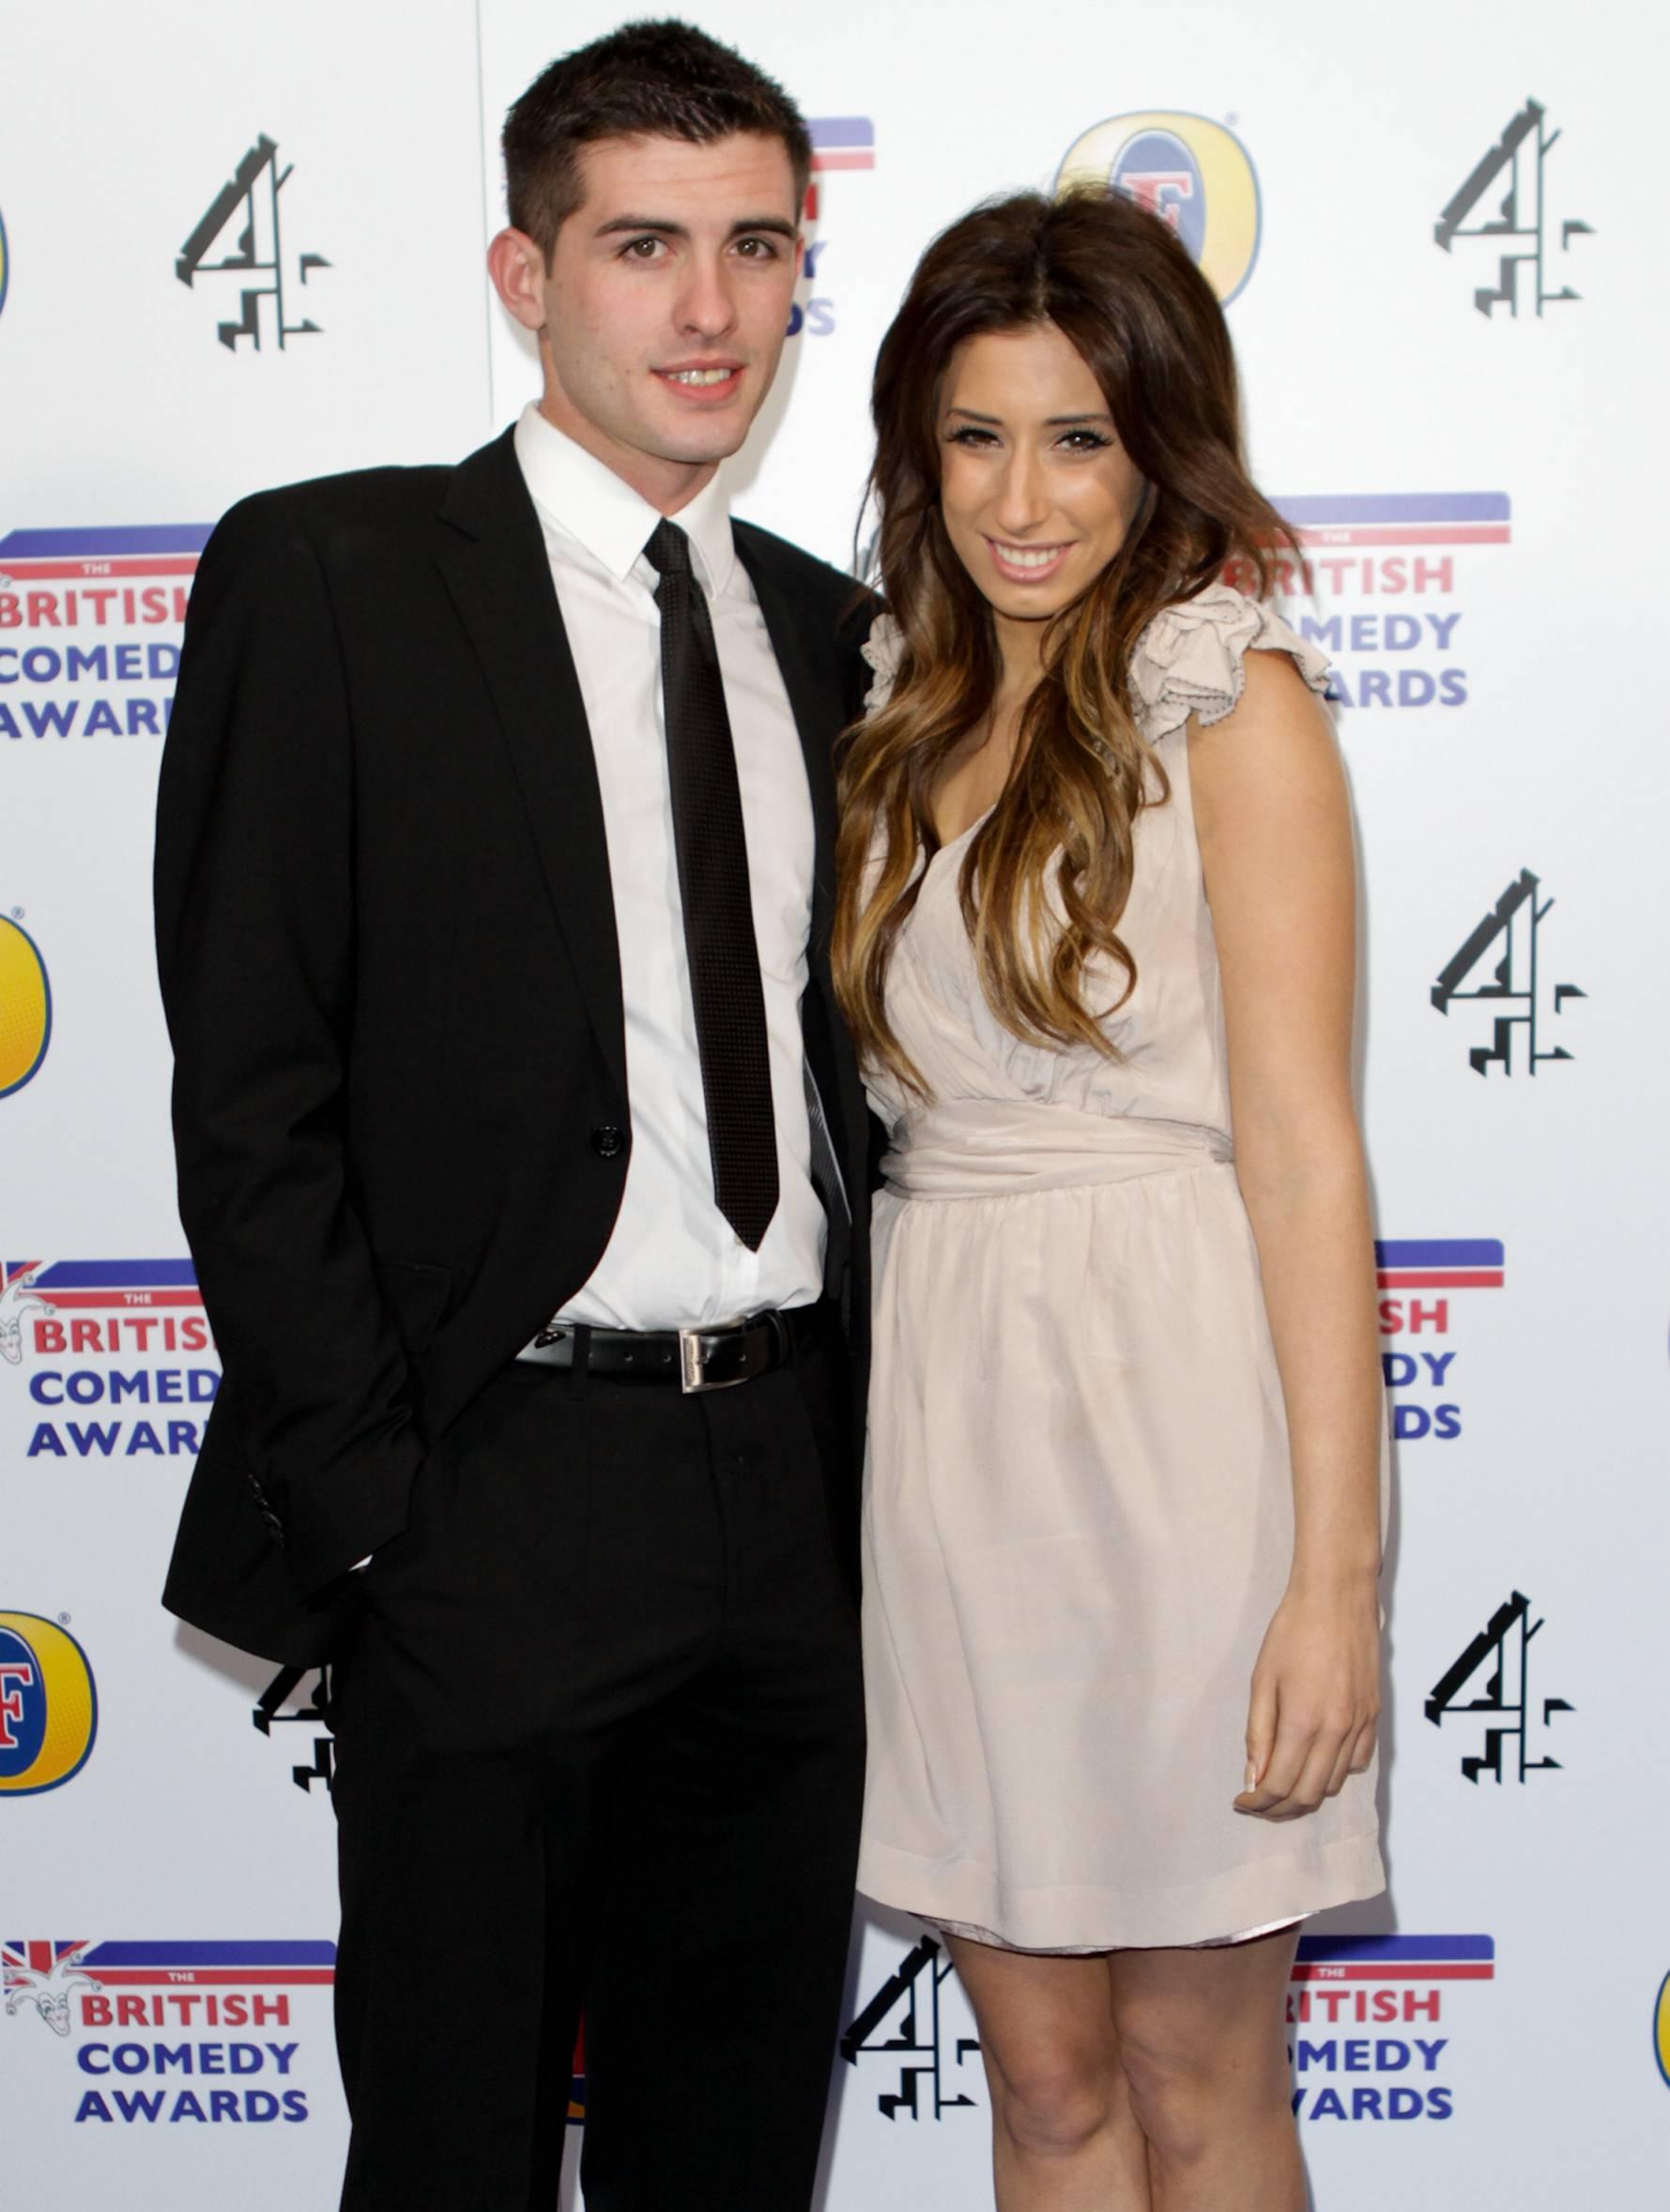 Stacey และอดีต Aaron Barham - พ่อของ Leighton